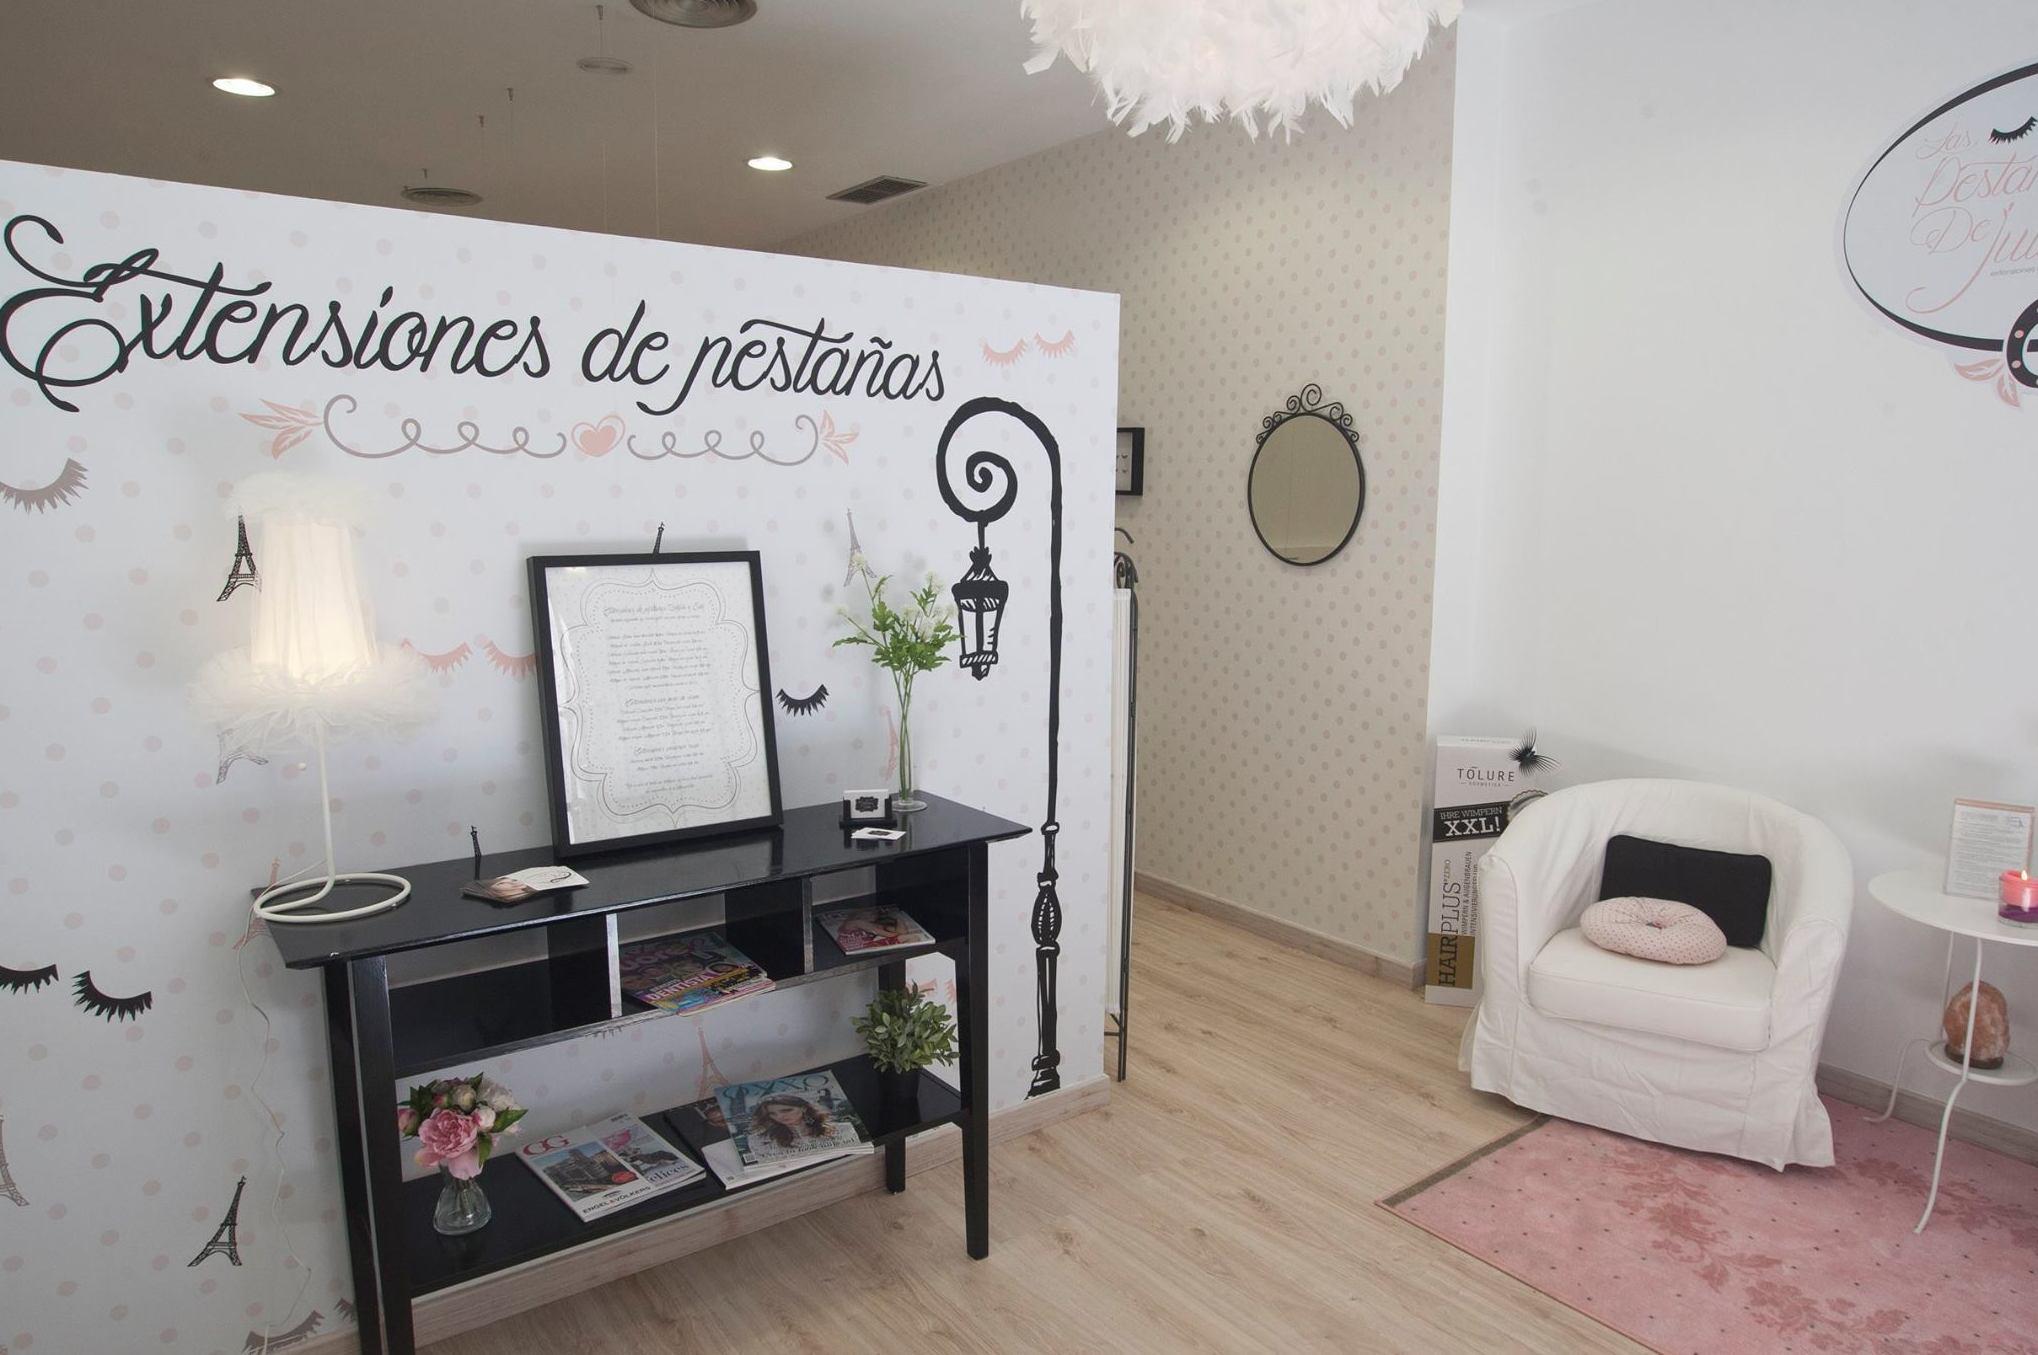 Foto 32 de Centros de estética en València | Las Pestañas de Julia